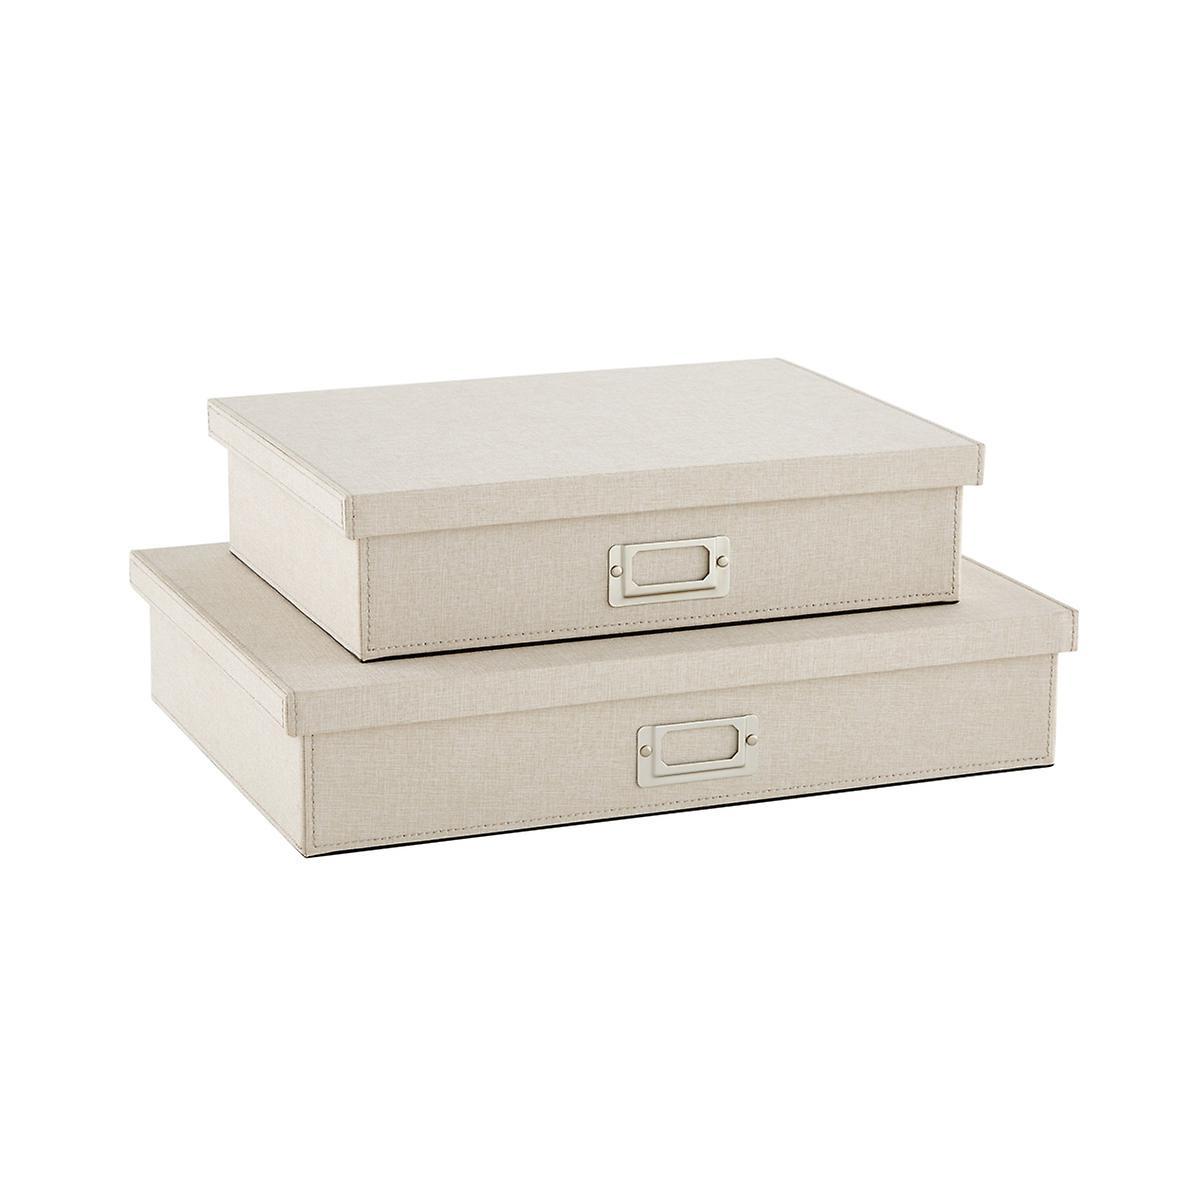 Linen Wedding Anniversary Gifts, Linen Napkins Box